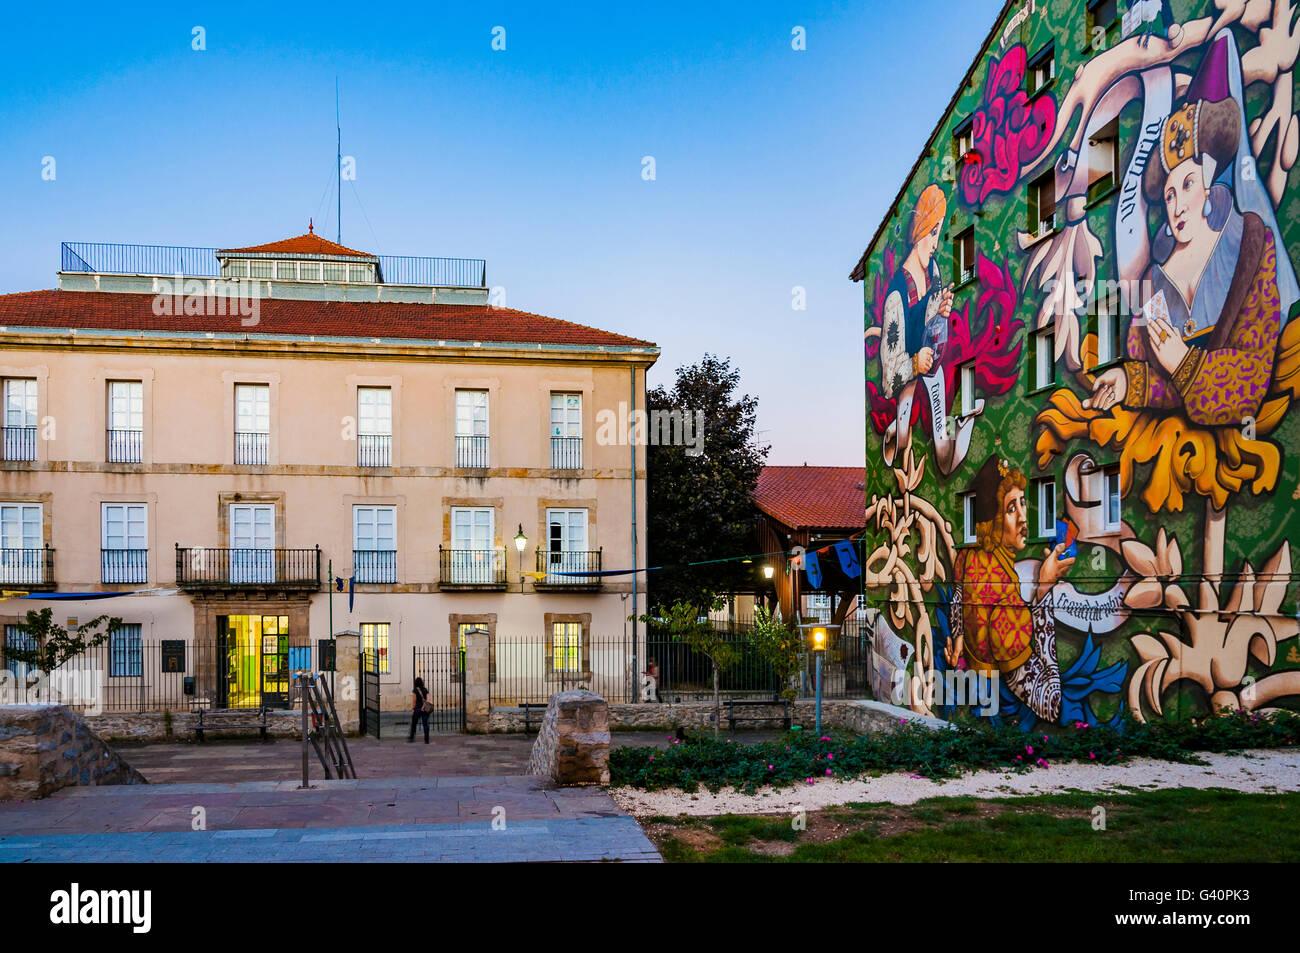 El Triunfo de Vitoria. Wandbild Route von Vitoria, IMVG. Calle Santa María 9. Vitoria-Gasteiz, Álava, Stockbild